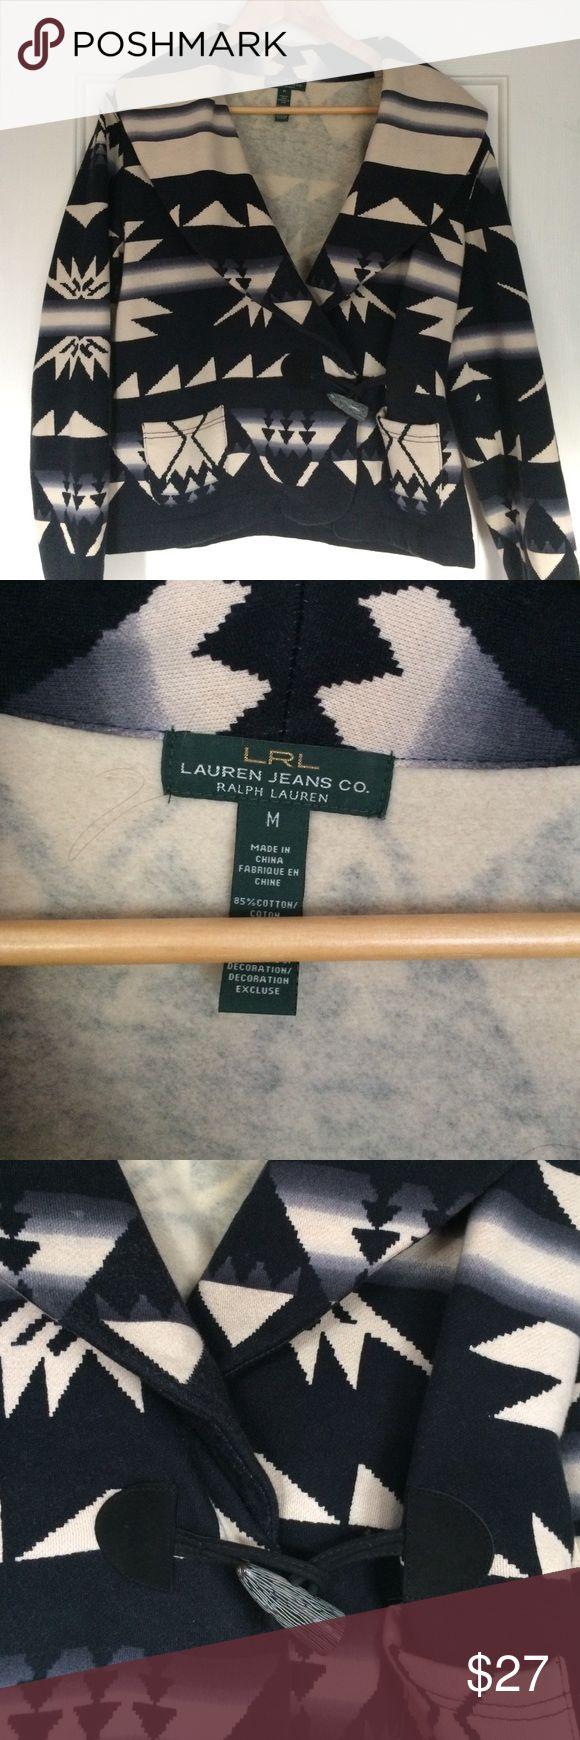 "Ralph Lauren Navajo print jacket like new Lauren jeans co by Ralph Lauren Navajo print jacket. Two square front pockets and hook closure. Heavy knit ""sweatshirt"" material. Like new condition. Size medium. Ralph Lauren Jackets & Coats Blazers"